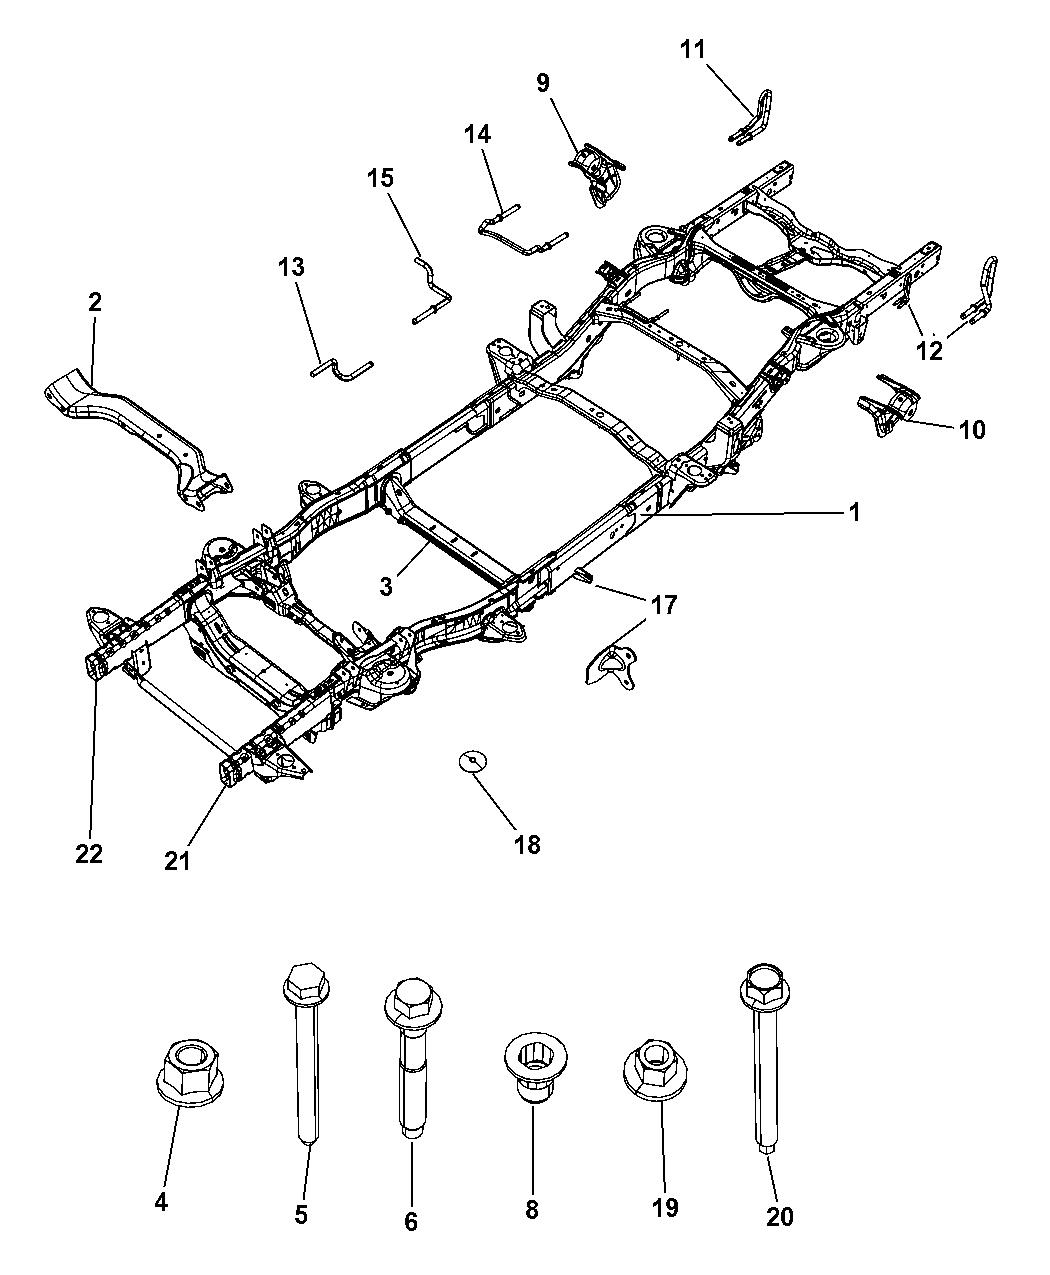 Genuine Hyundai 59750-2B600 Parking Brake Cable Assembly